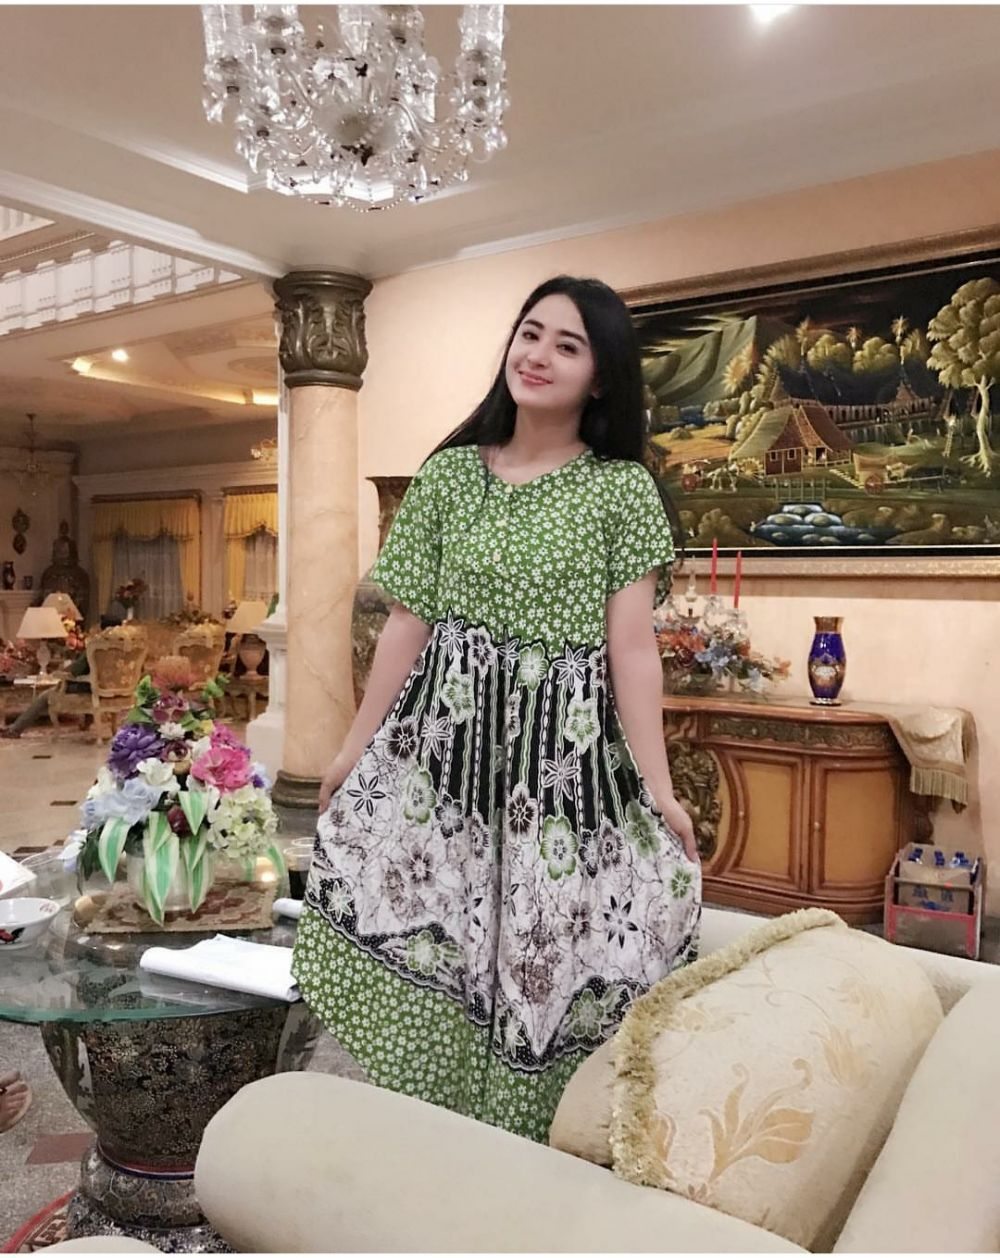 Deretan Gaya Artis Kaya Raya yang Hobi Pakai Daster, No Jaim!